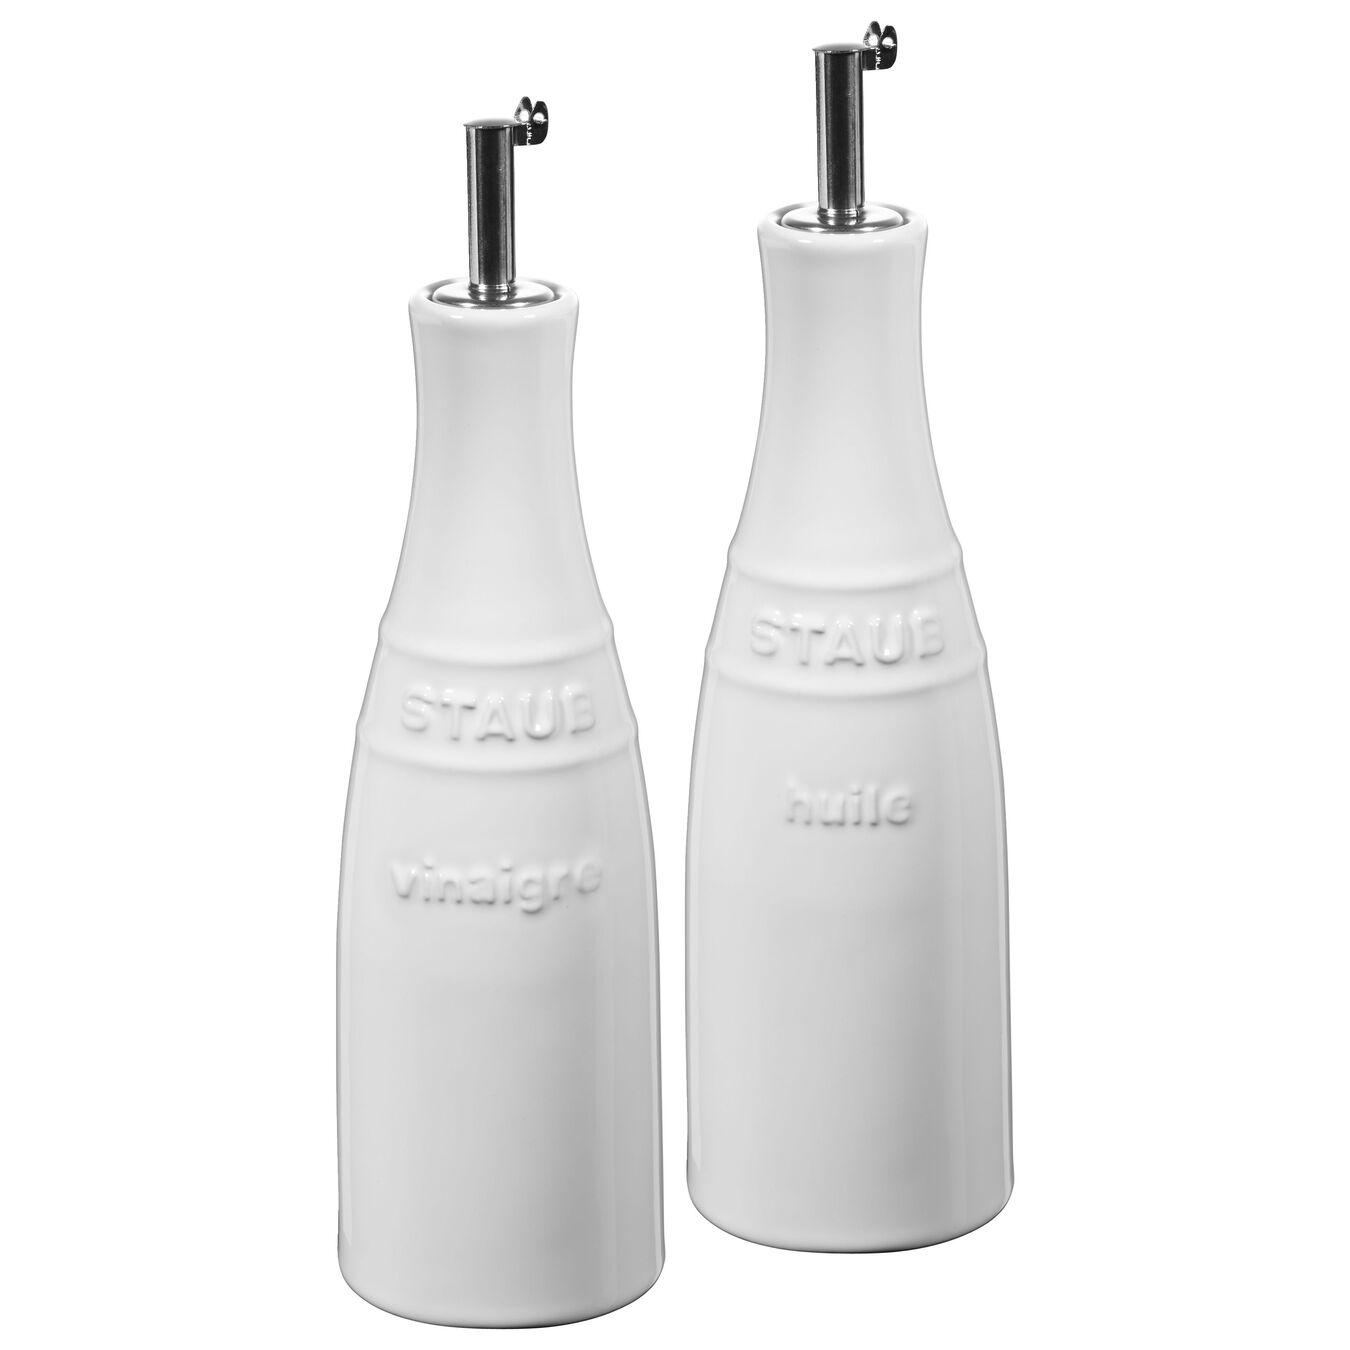 2 Piece / 250 ml Ceramic Oil and vinegar set, Pure-White,,large 1